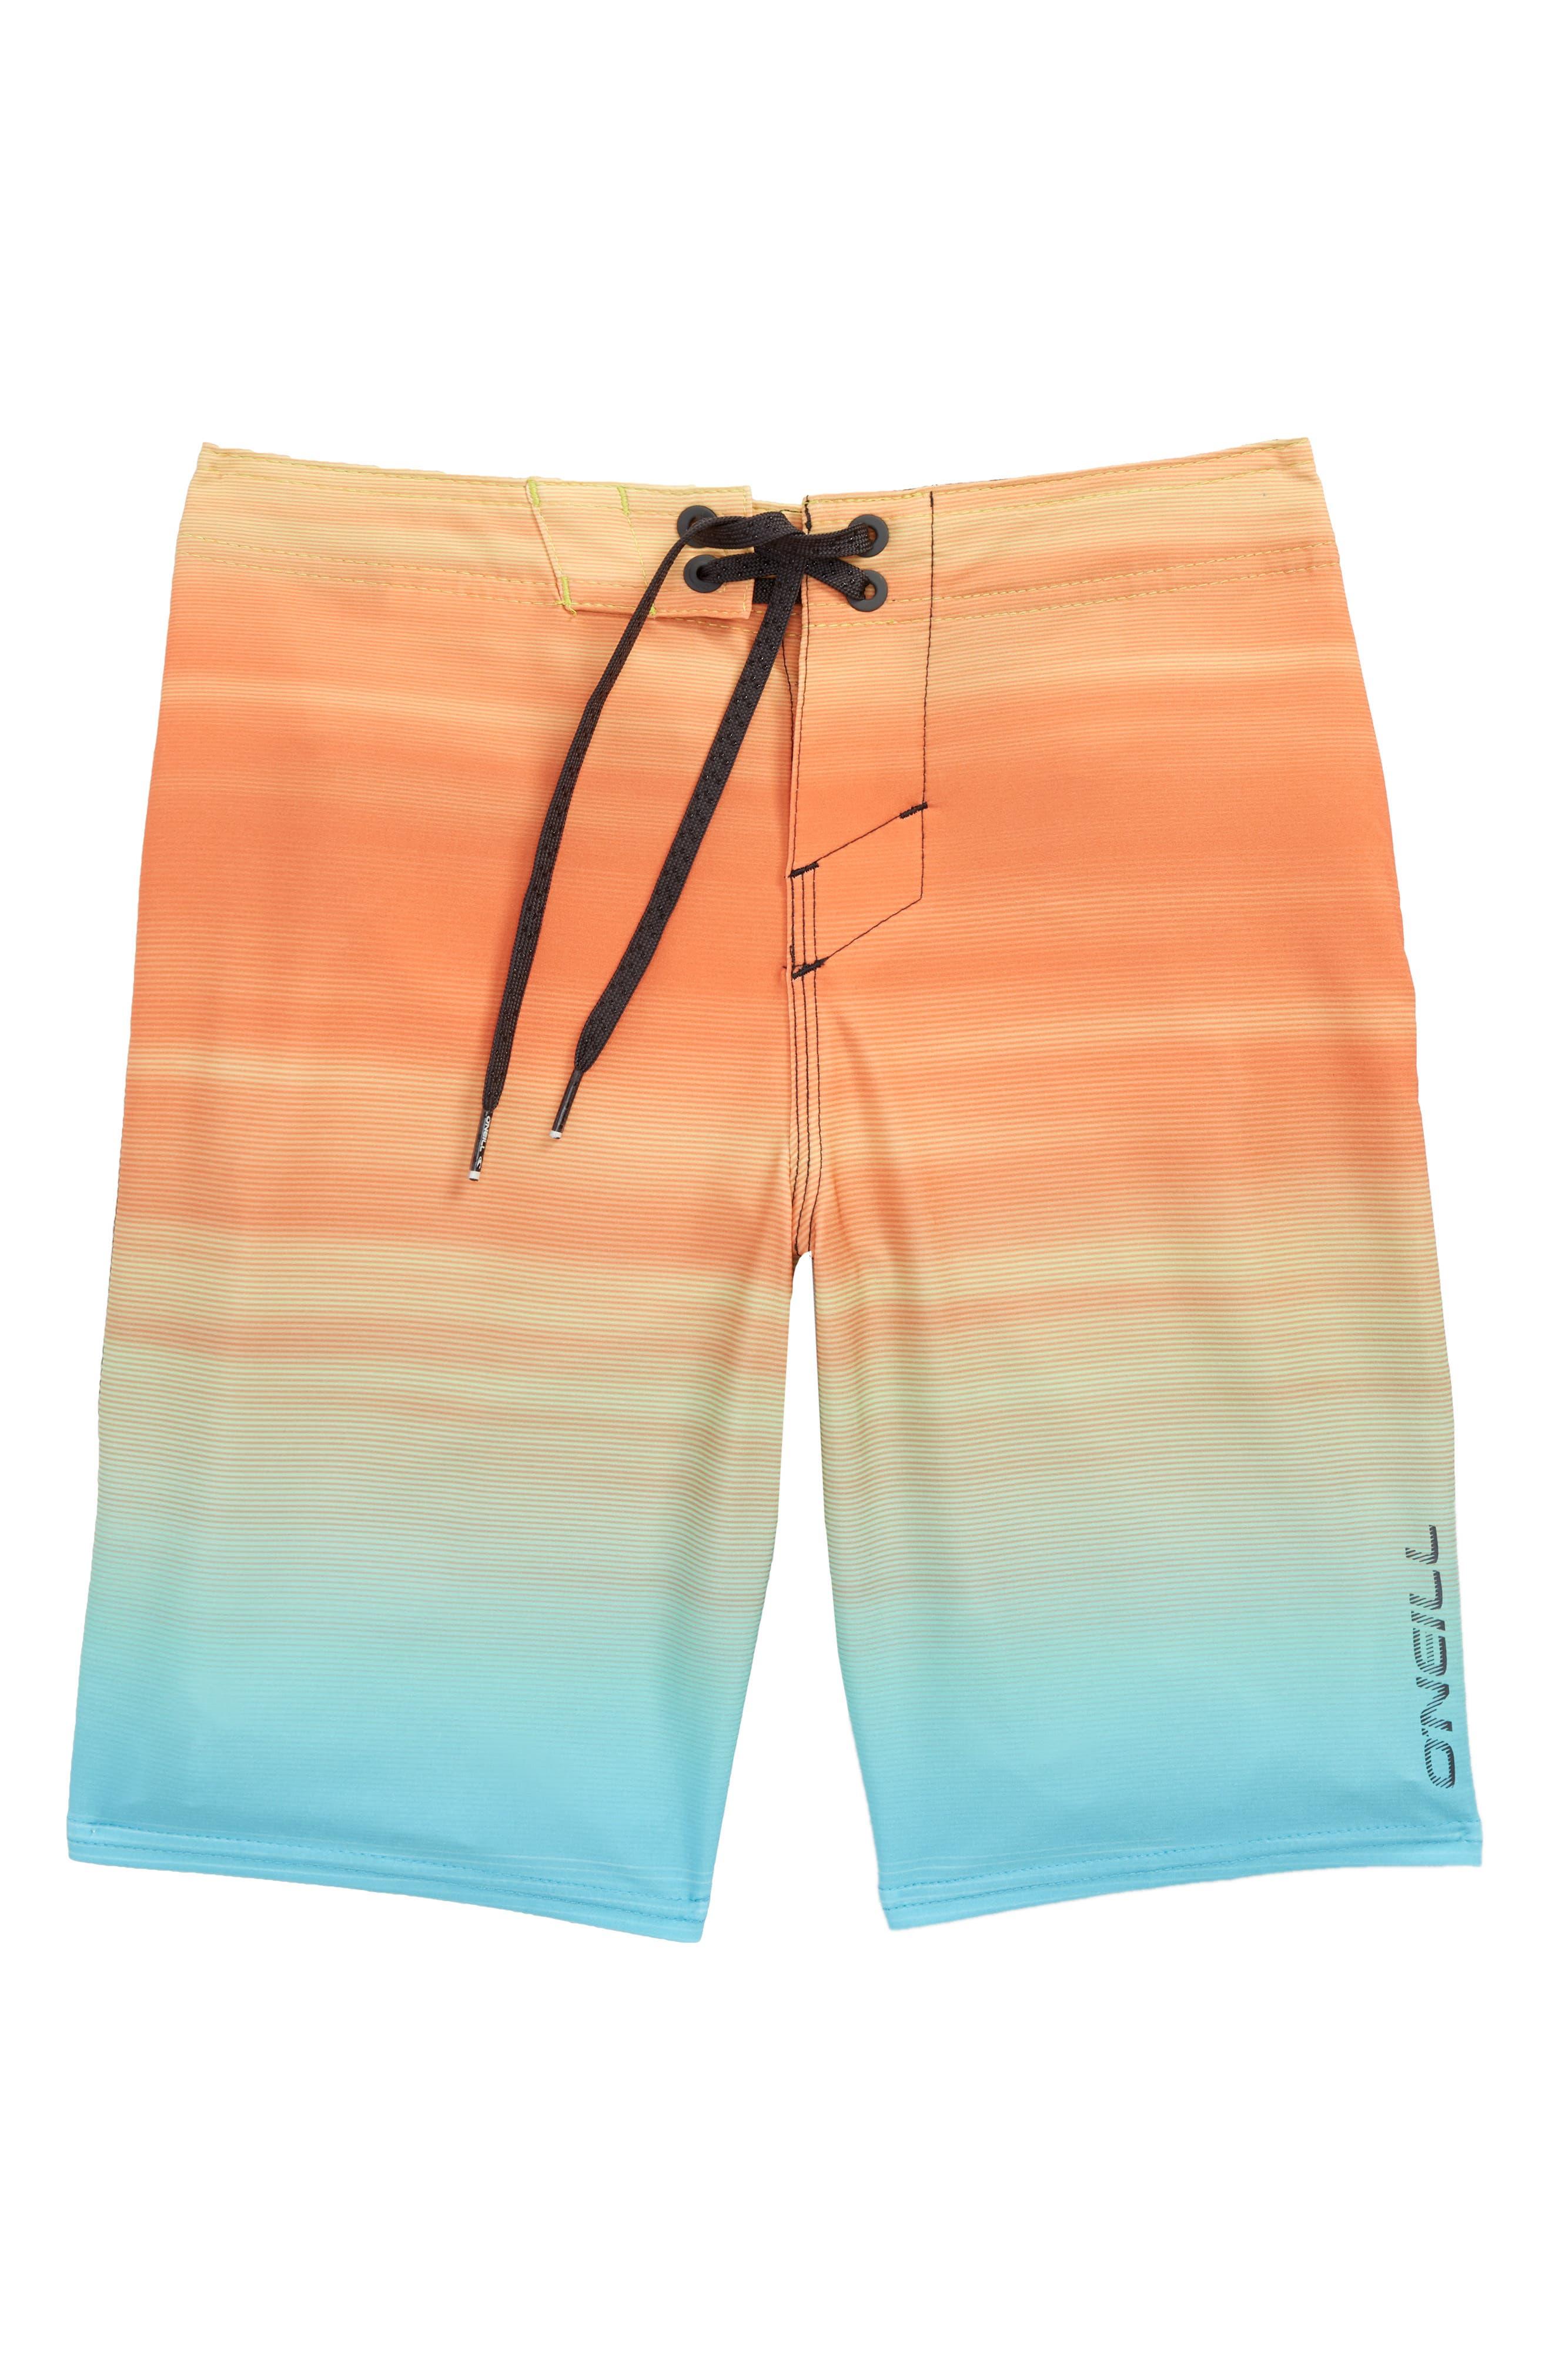 Sneakyfreak Mysto Board Shorts,                         Main,                         color, Multi